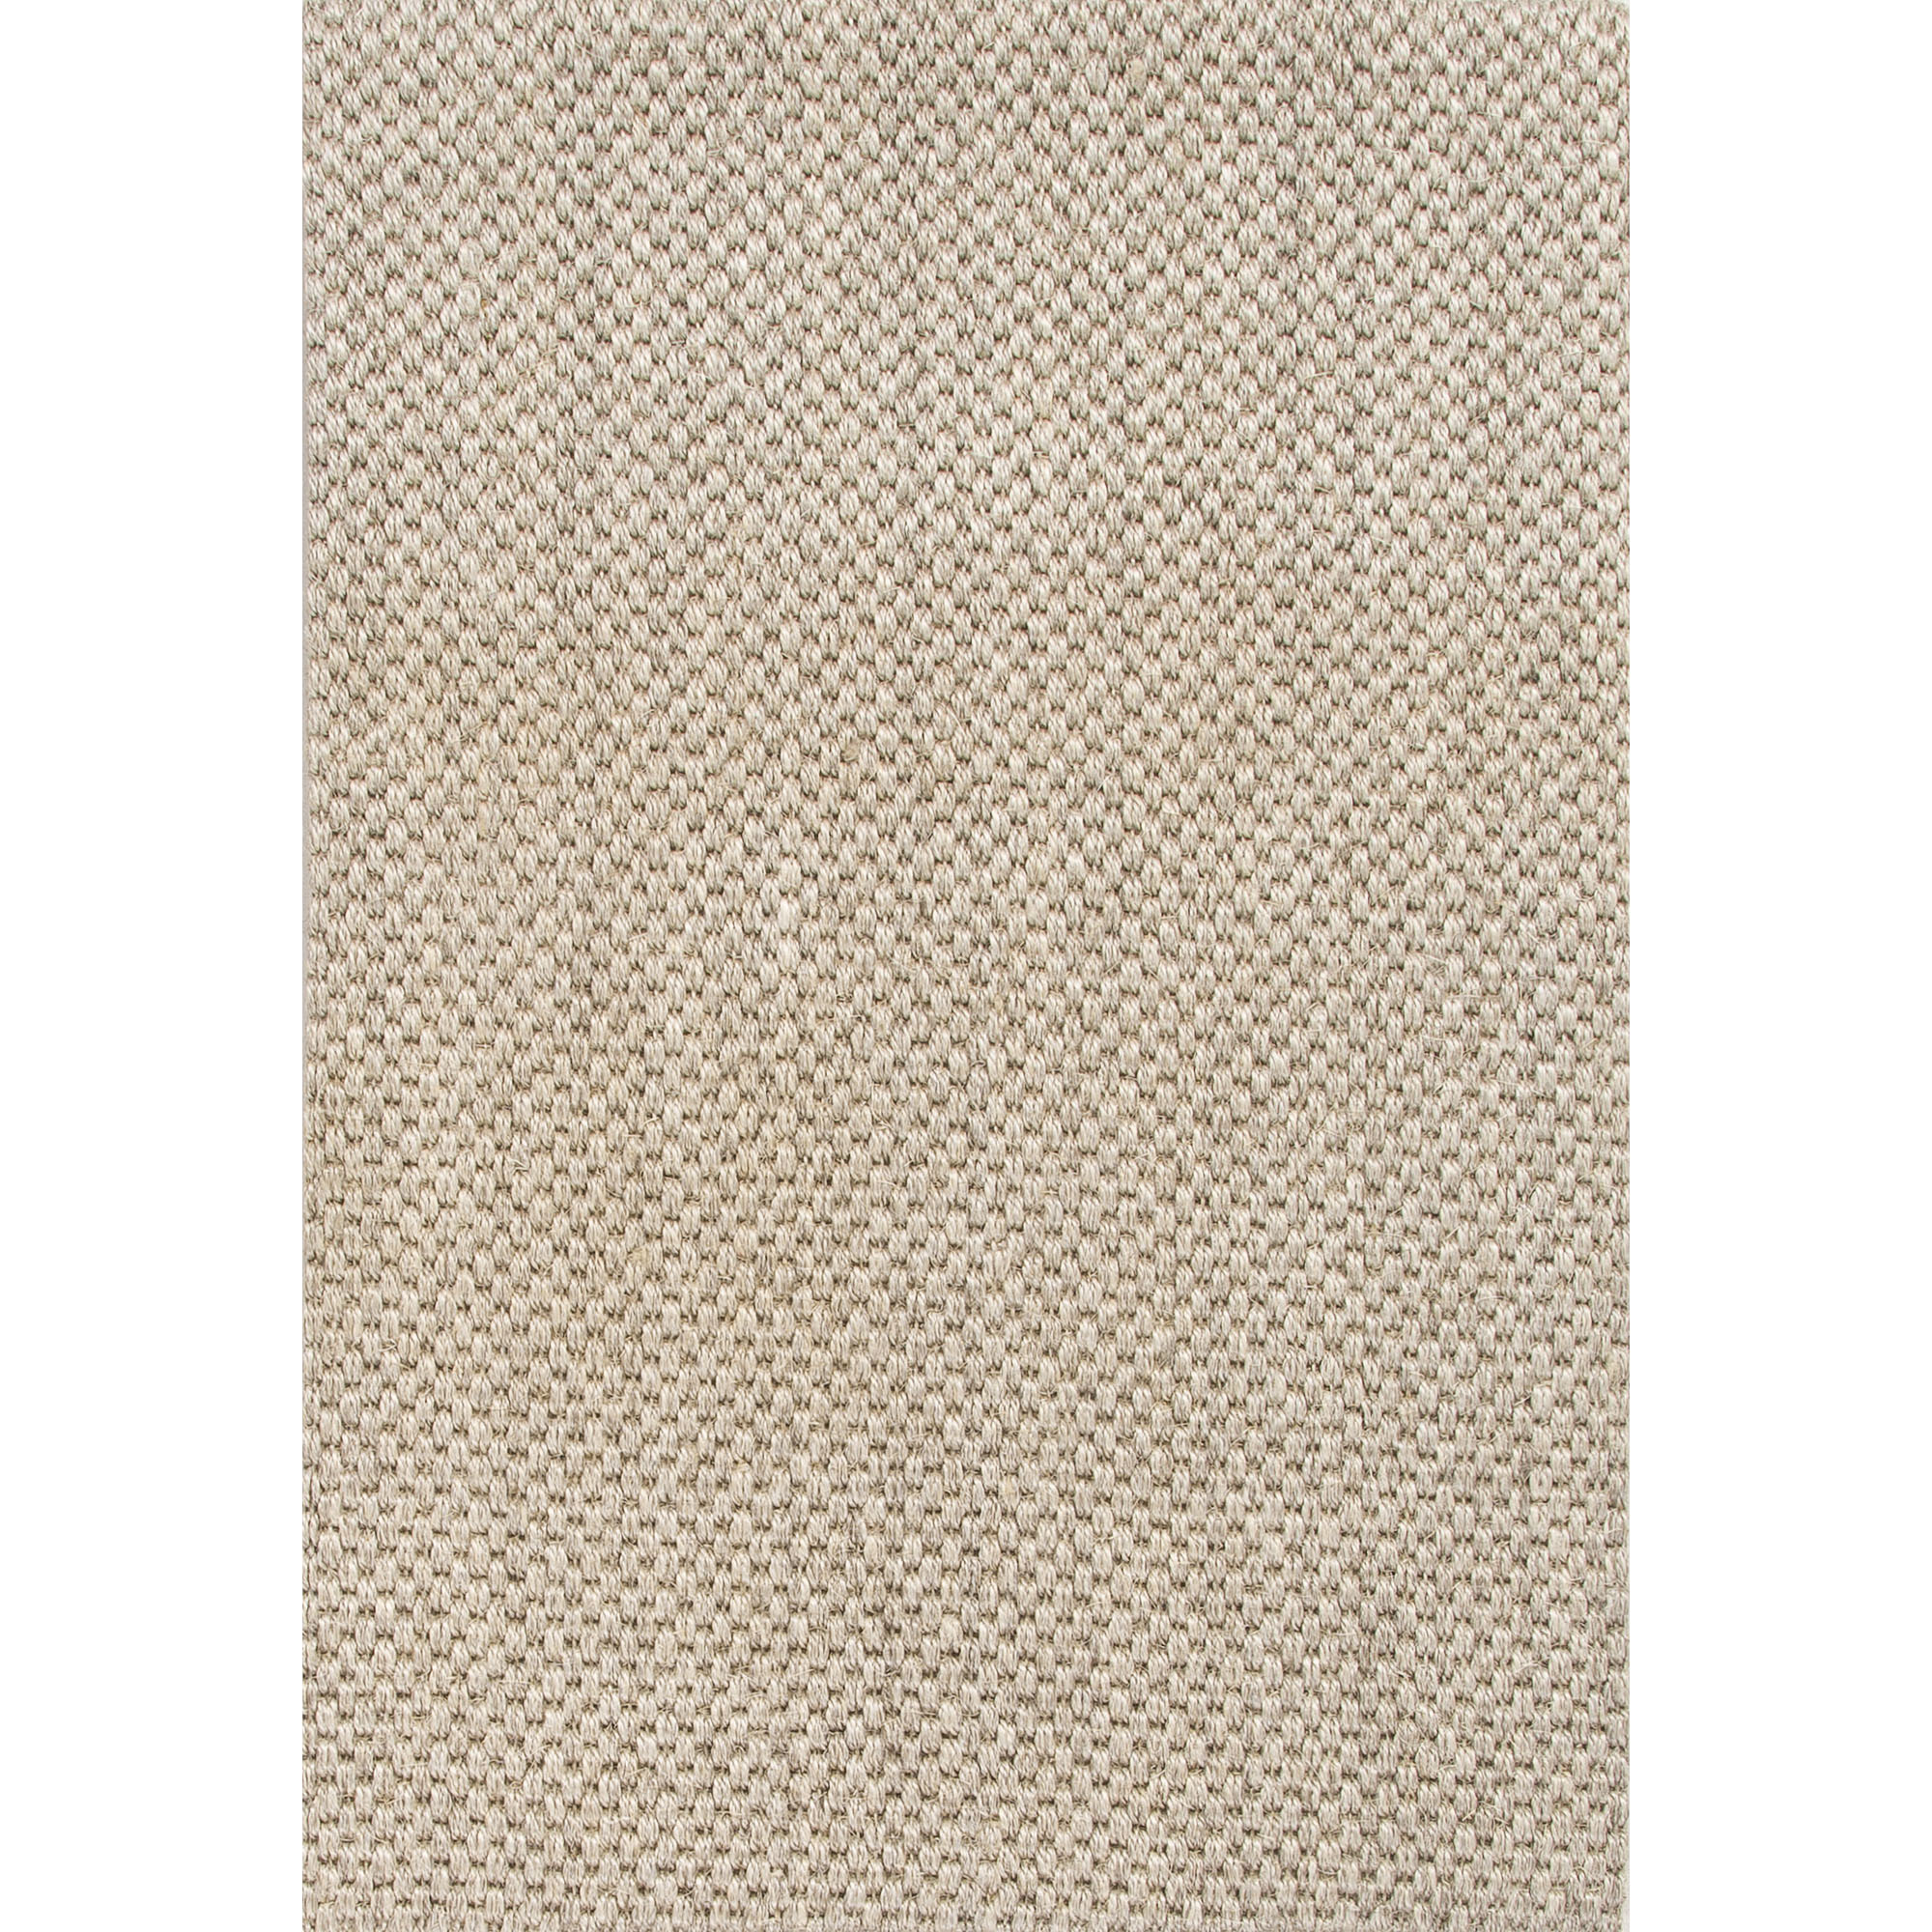 JAIPUR Rugs Naturals Sanibel 3 x 5 Rug - Item Number: RUG119173